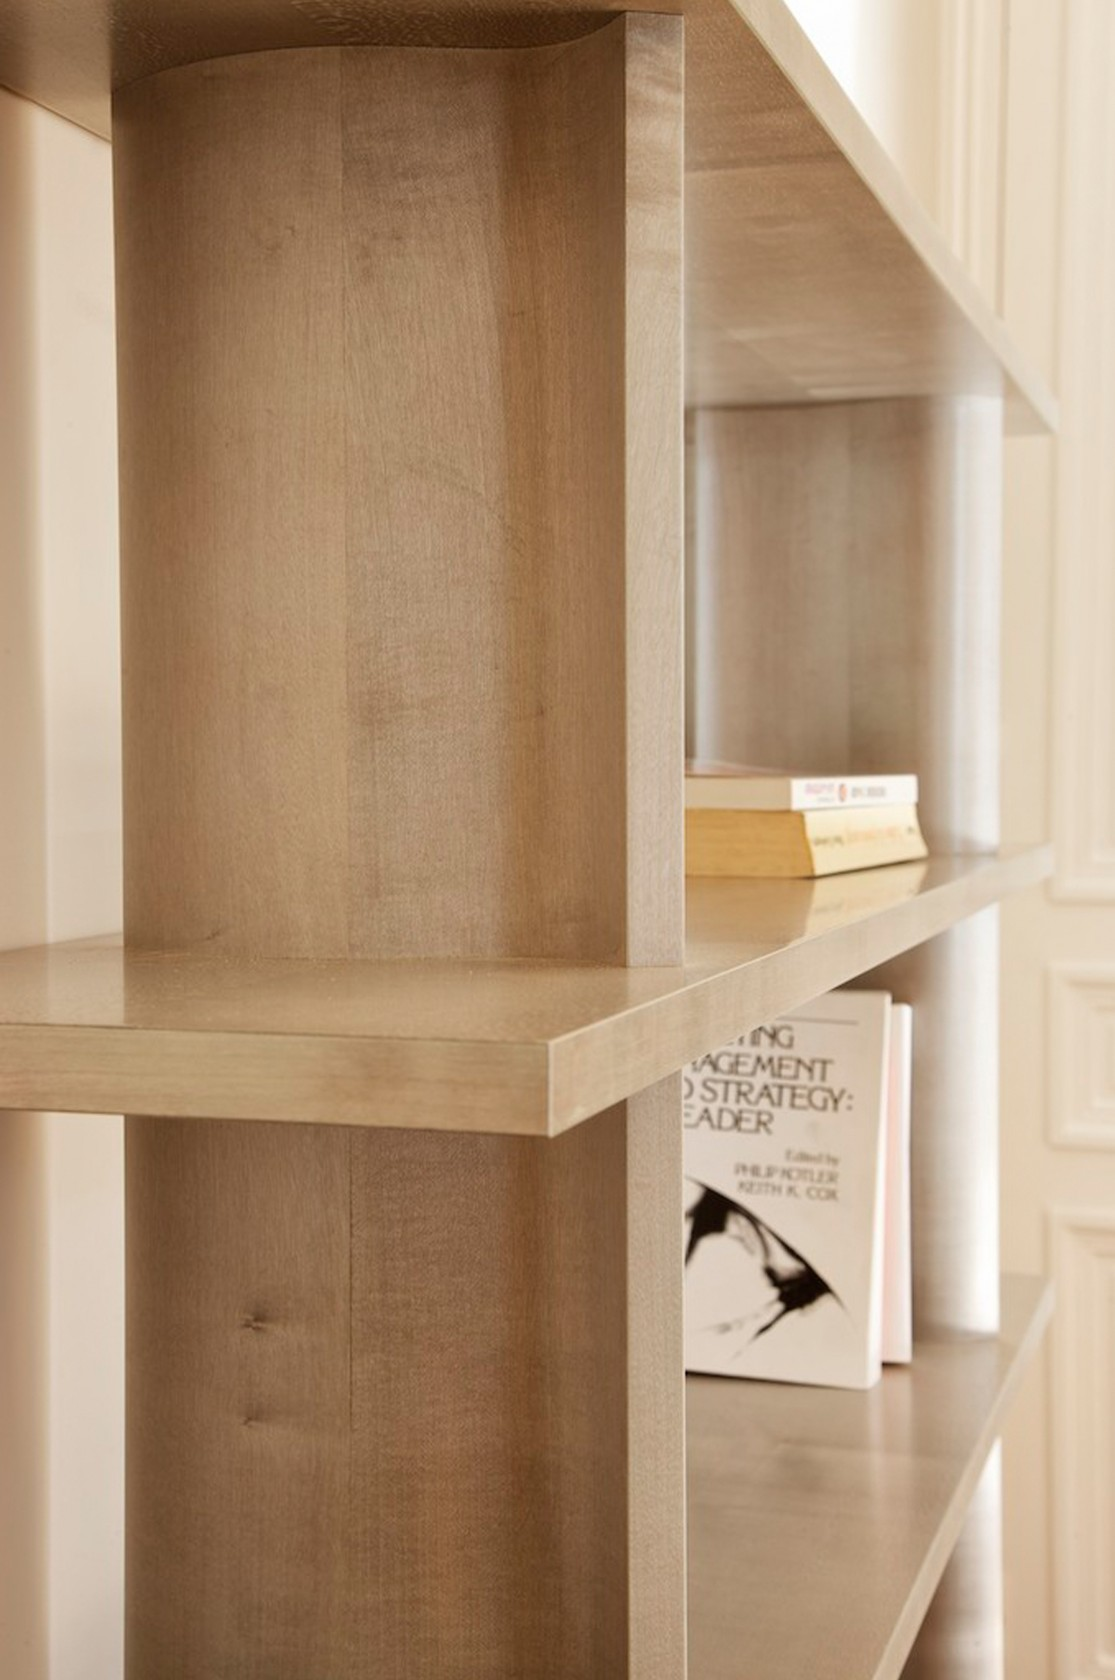 biblioth que paquebot ludovic avenel b niste cr ateur paris. Black Bedroom Furniture Sets. Home Design Ideas